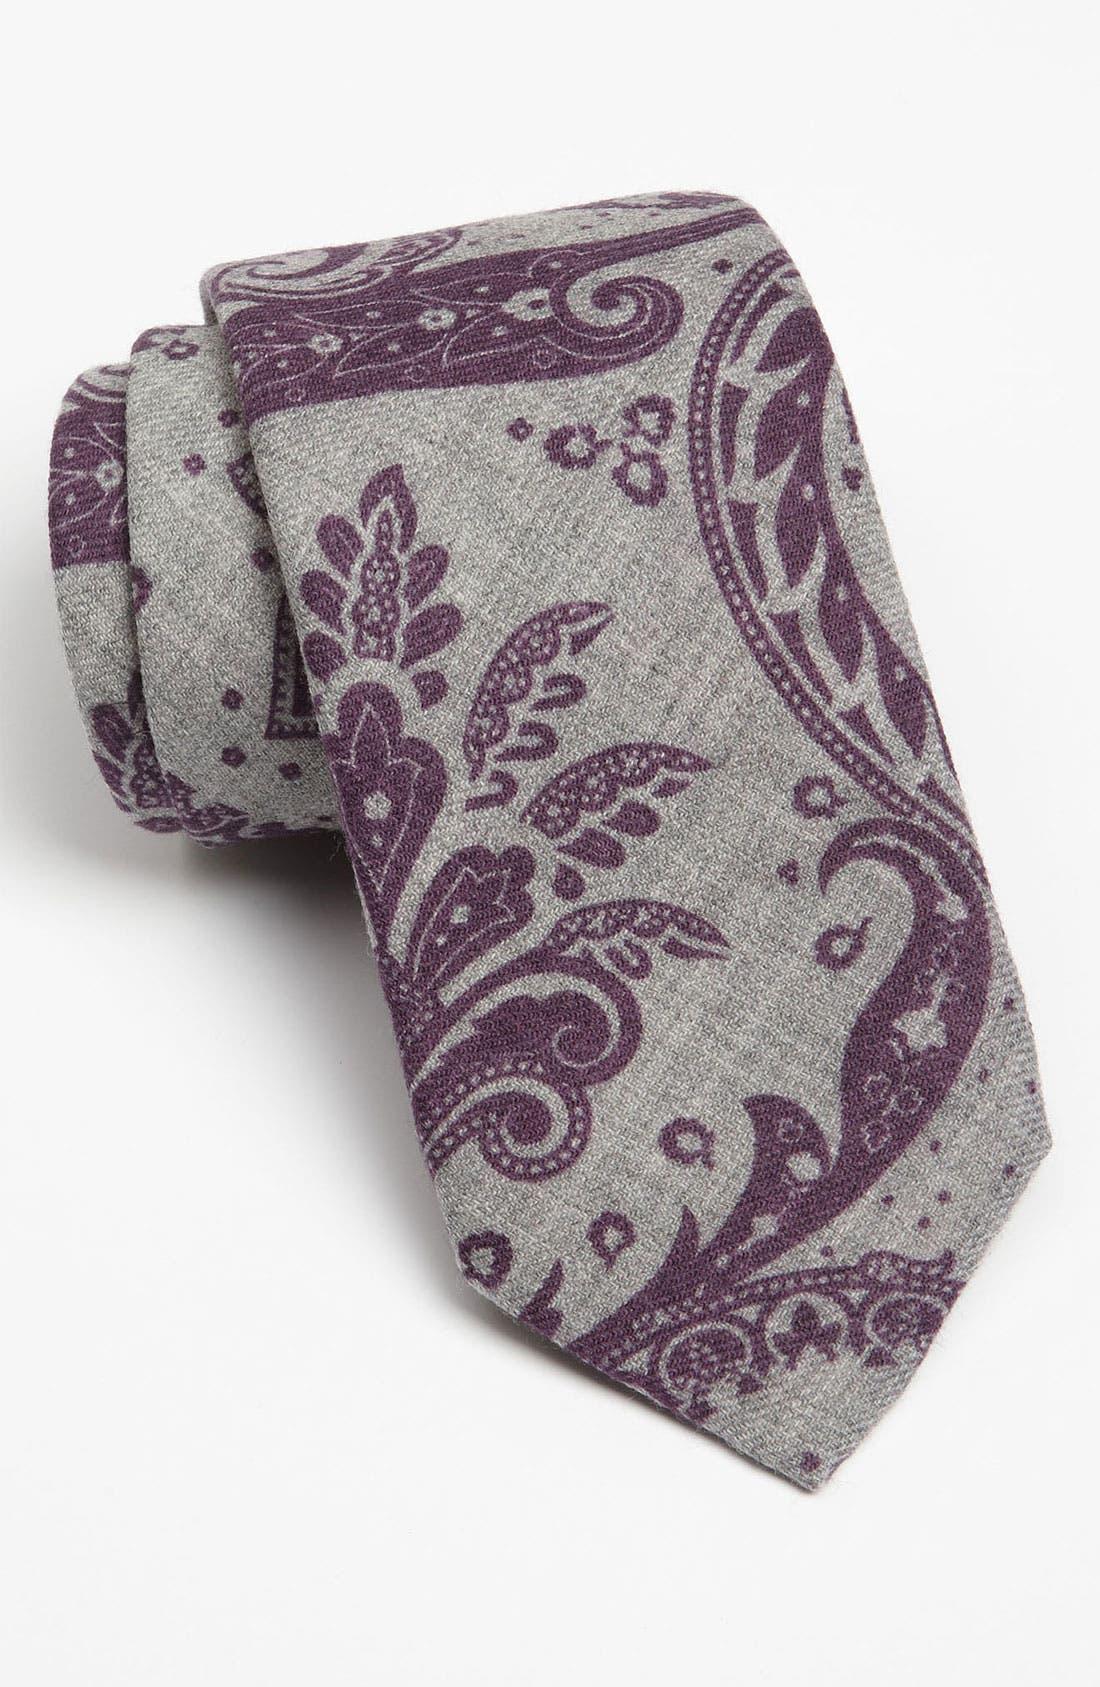 Alternate Image 1 Selected - Robert Talbott Woven Wool Tie